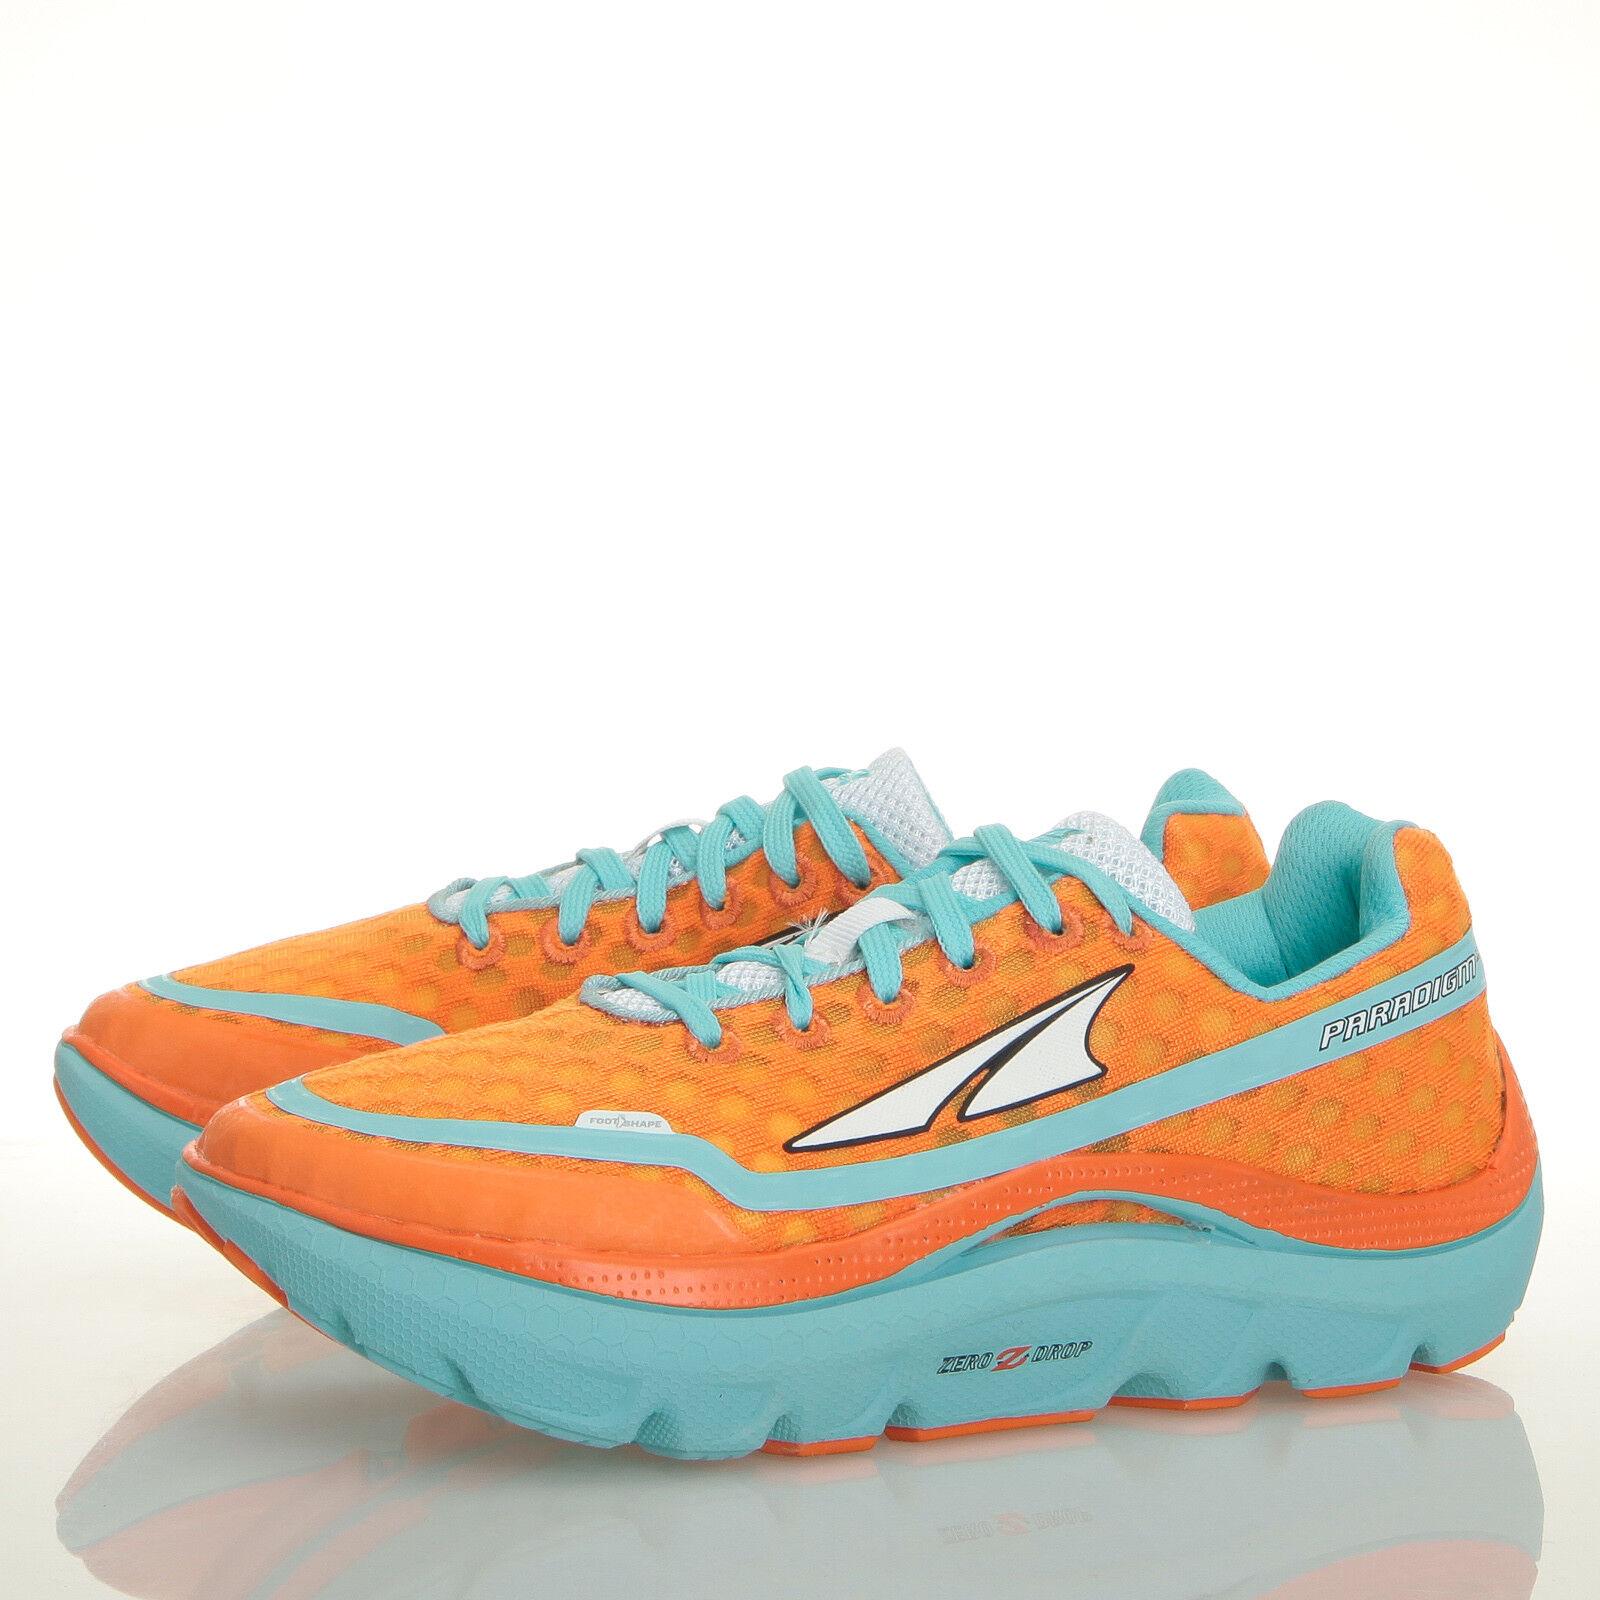 Altra Zero Drop Paradigm 1.5 Tangerine arancia Running  scarpe - donna 5.5 US  per poco costoso